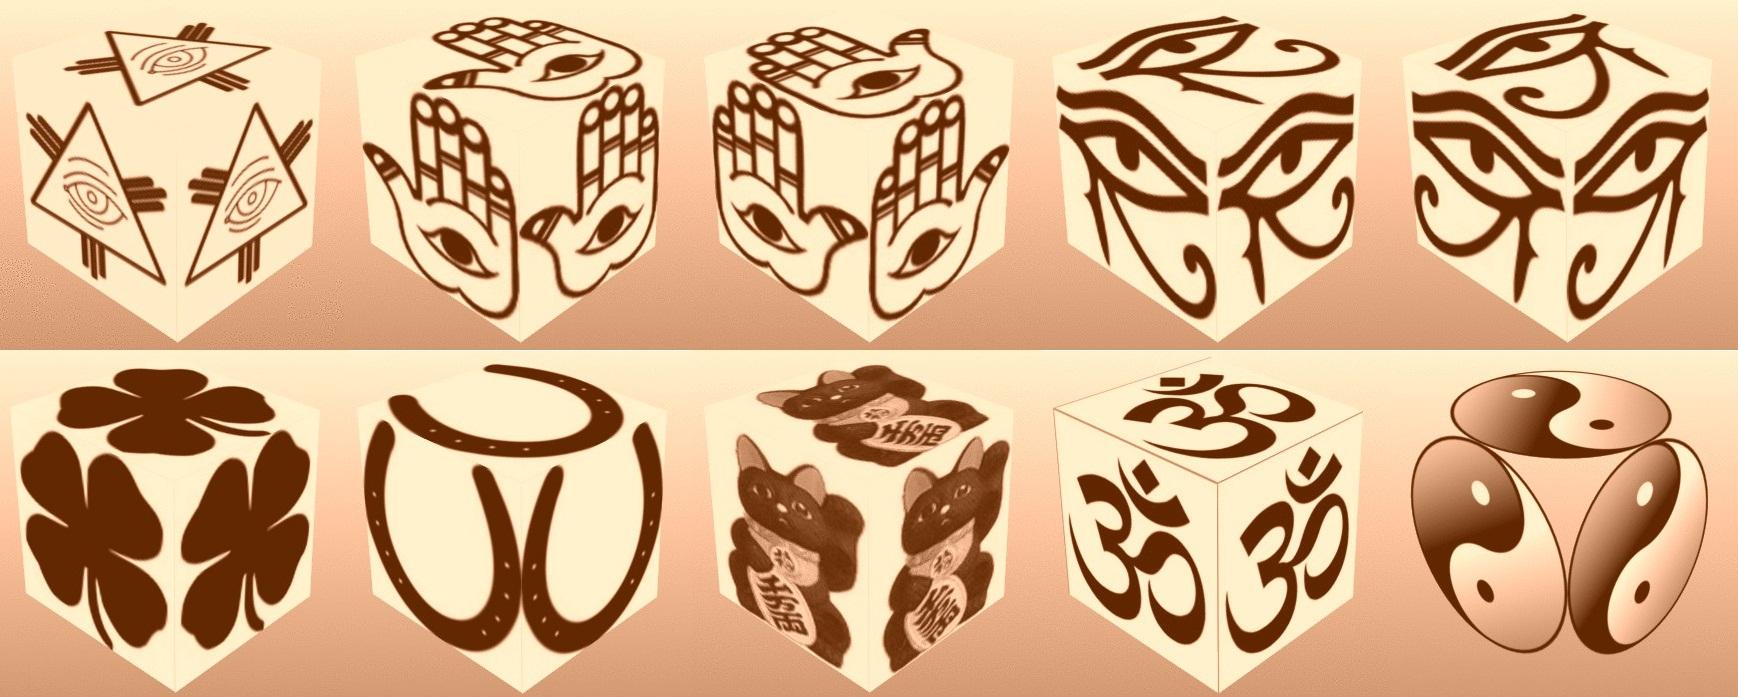 cube, 3d cube, lucky dice, luck symbols, Sepia Eye of Fatima, Sepia Eye of Providence, Sepia Four Leaf Clover, Sepia Horseshoe, Sepia Maneki Neko